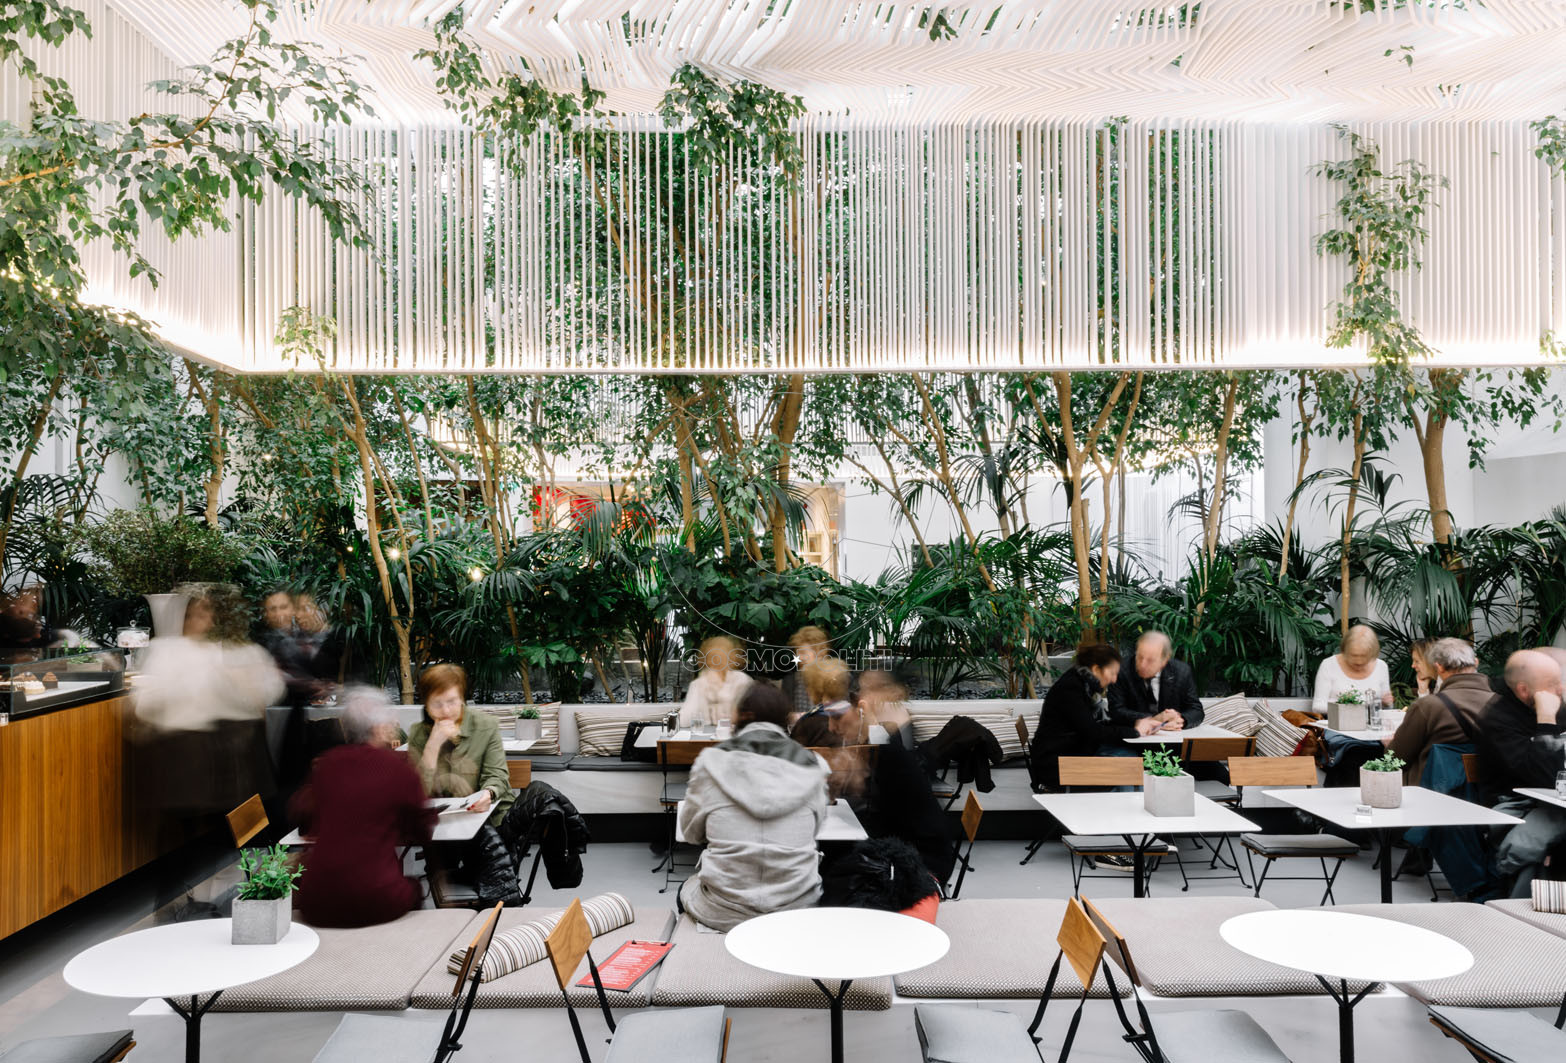 Cycladic Cafe1 © Paris Tavitian, Museum of Cycladic Art, 2020